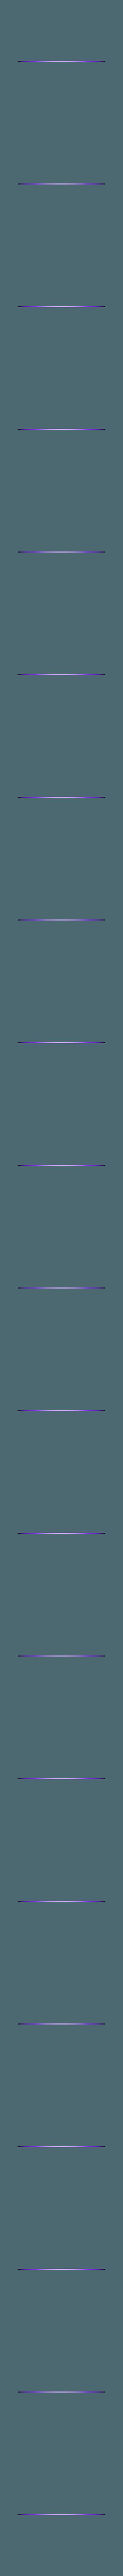 bucks_white.STL Download free STL file Minimal Multi-color NBA coasters • 3D print object, MosaicManufacturing